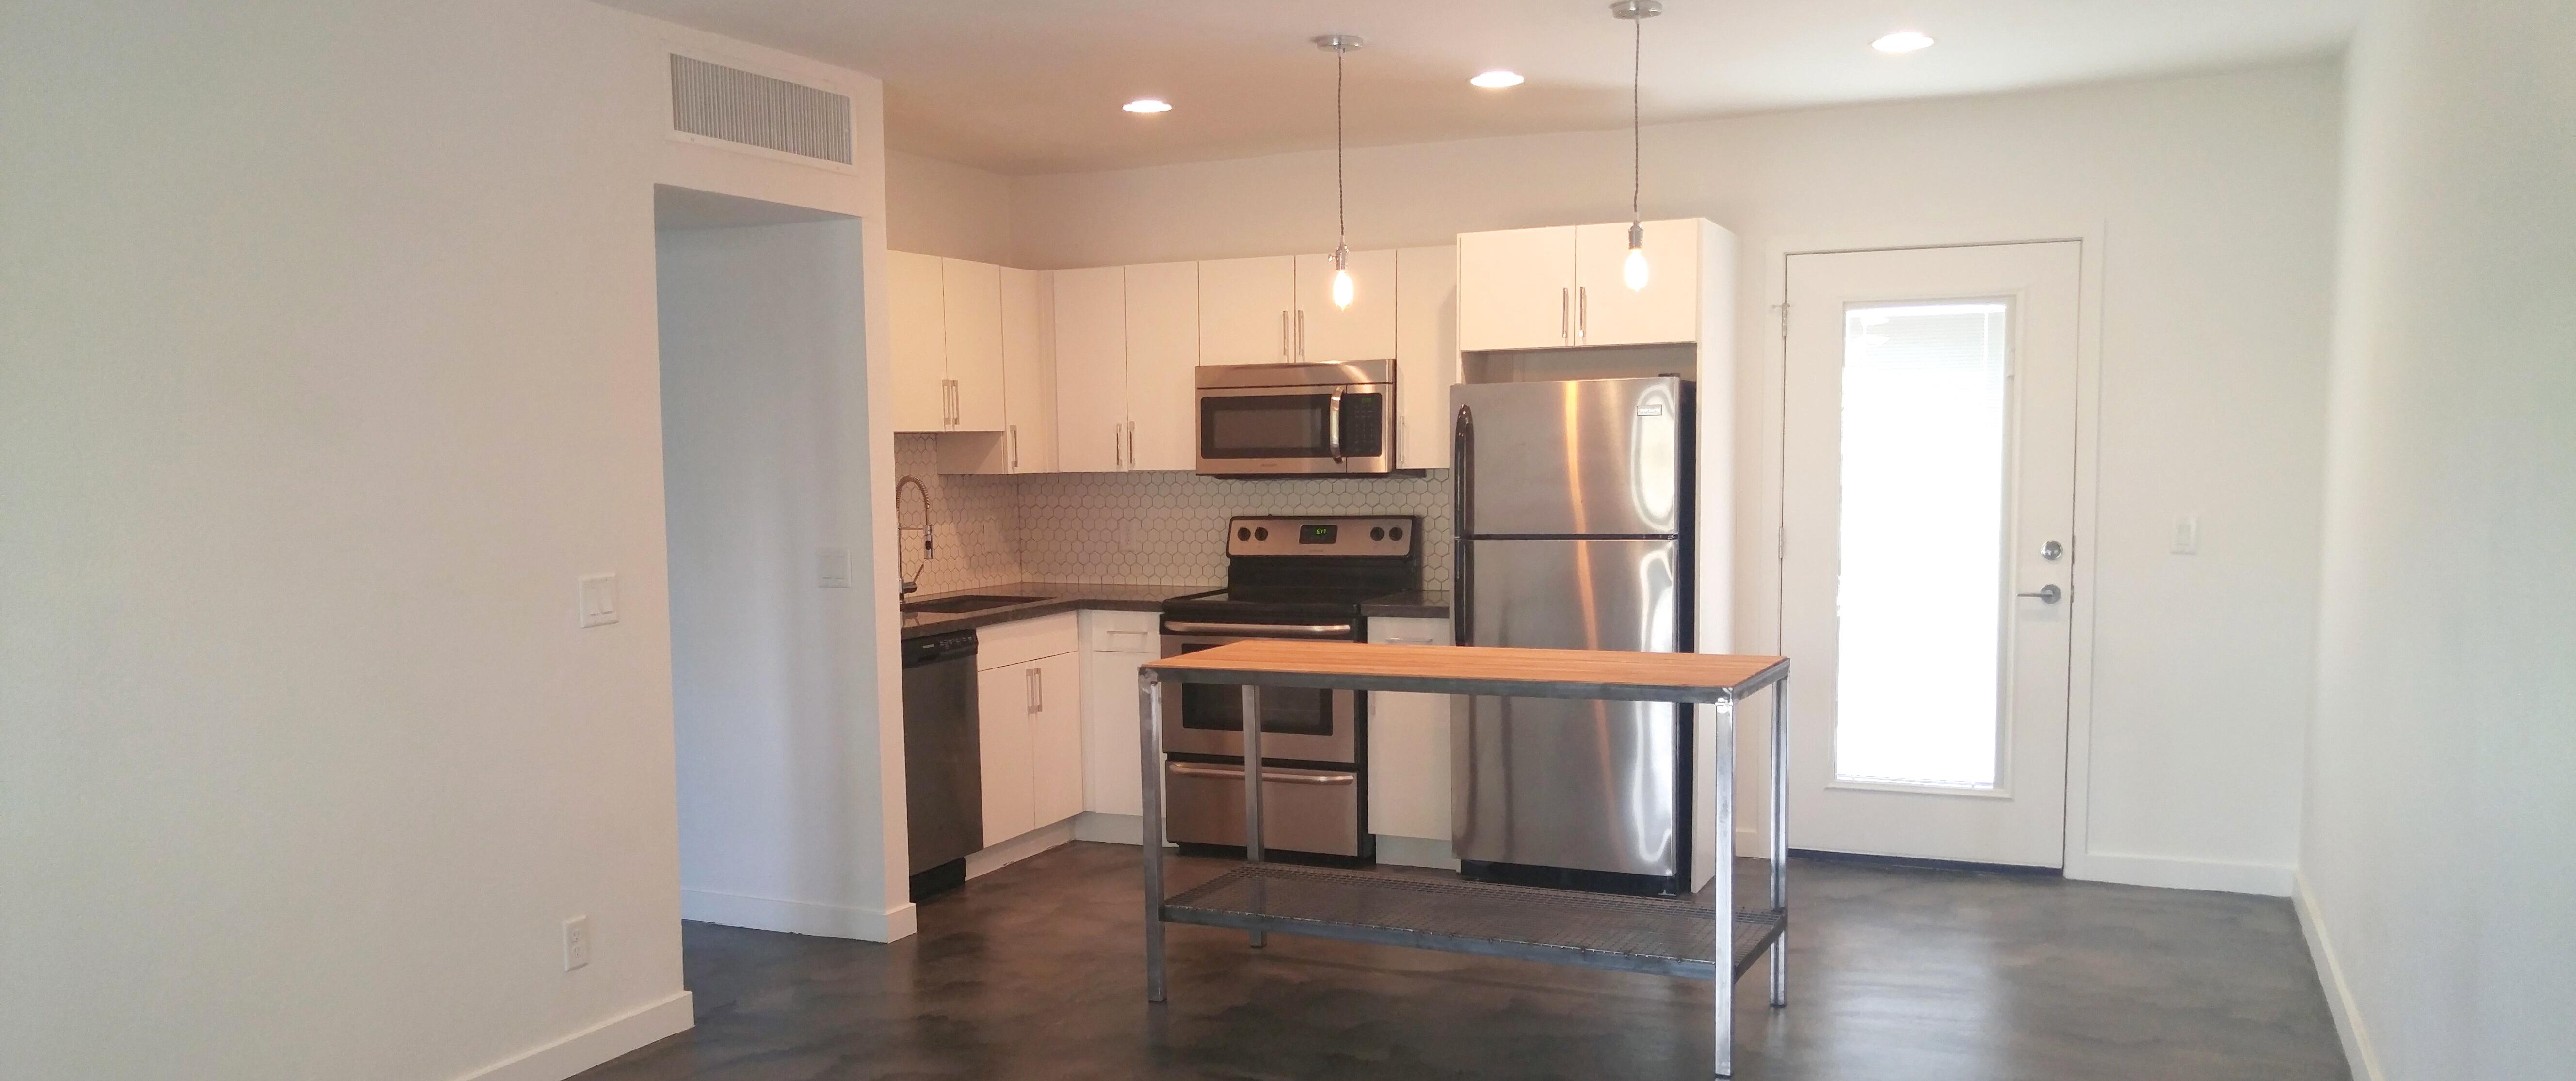 MODE @ 20th Street | Biltmore Phoenix Apartments | 4237 N 20th St, Phoenix, AZ 85016